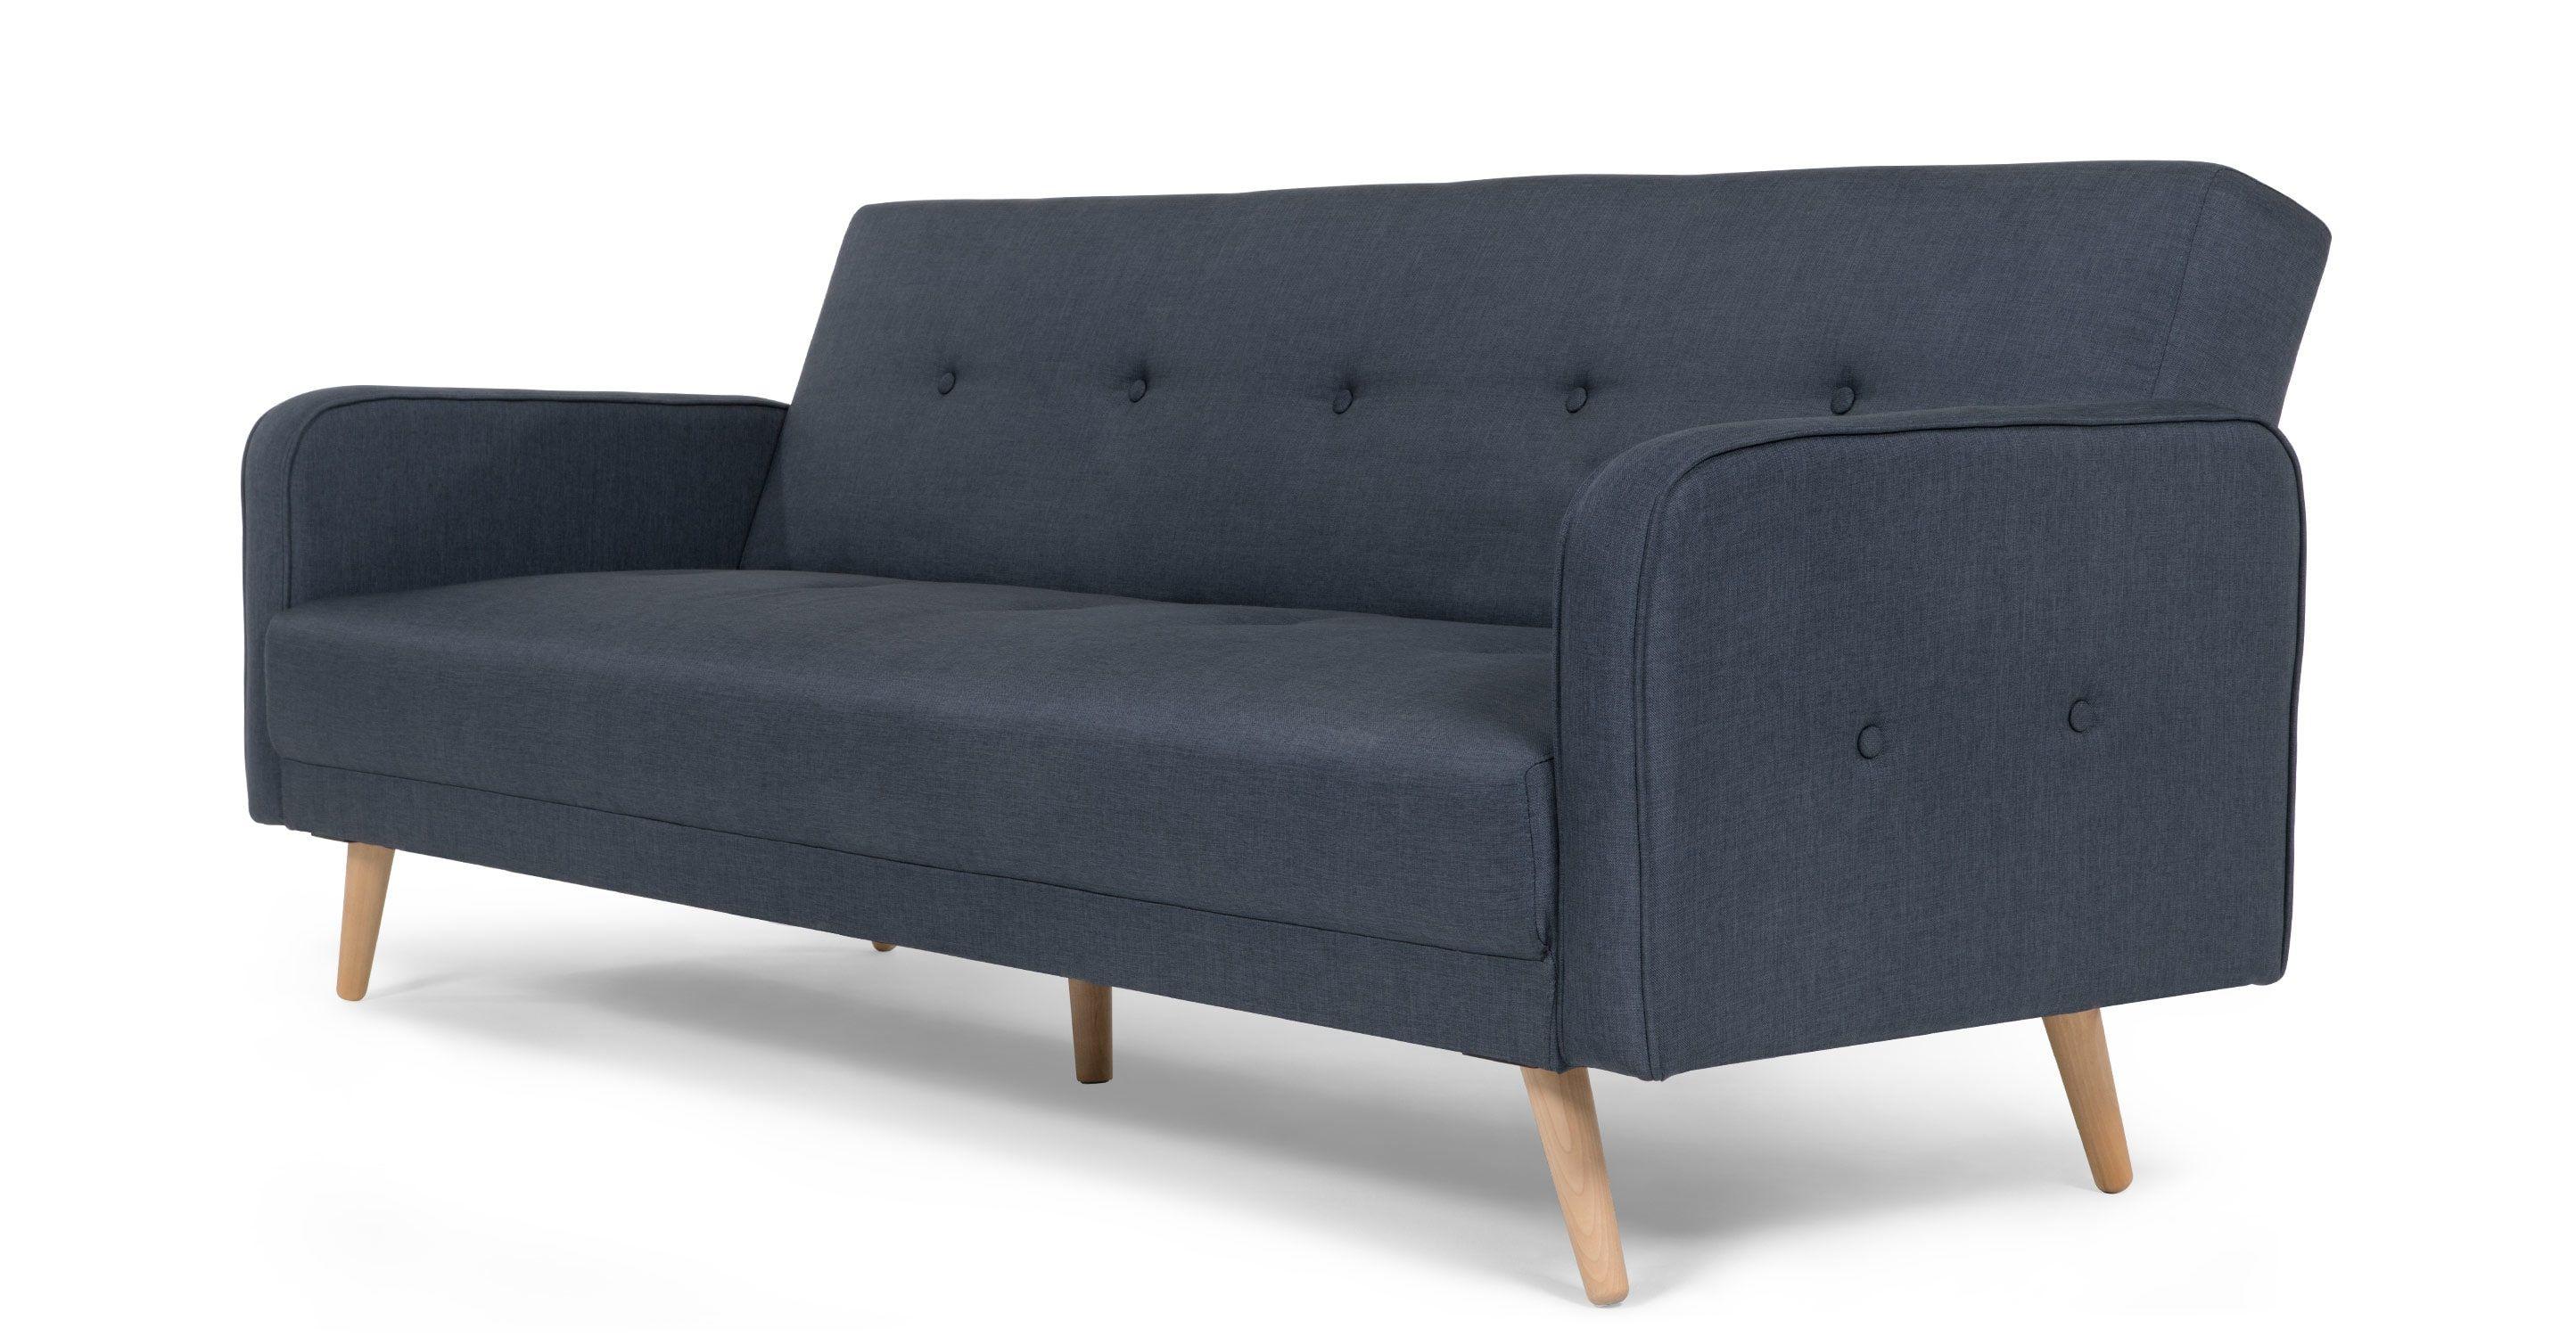 Chou Schlafsofa Quarzblau Sofa Bed For Small Spaces Modern